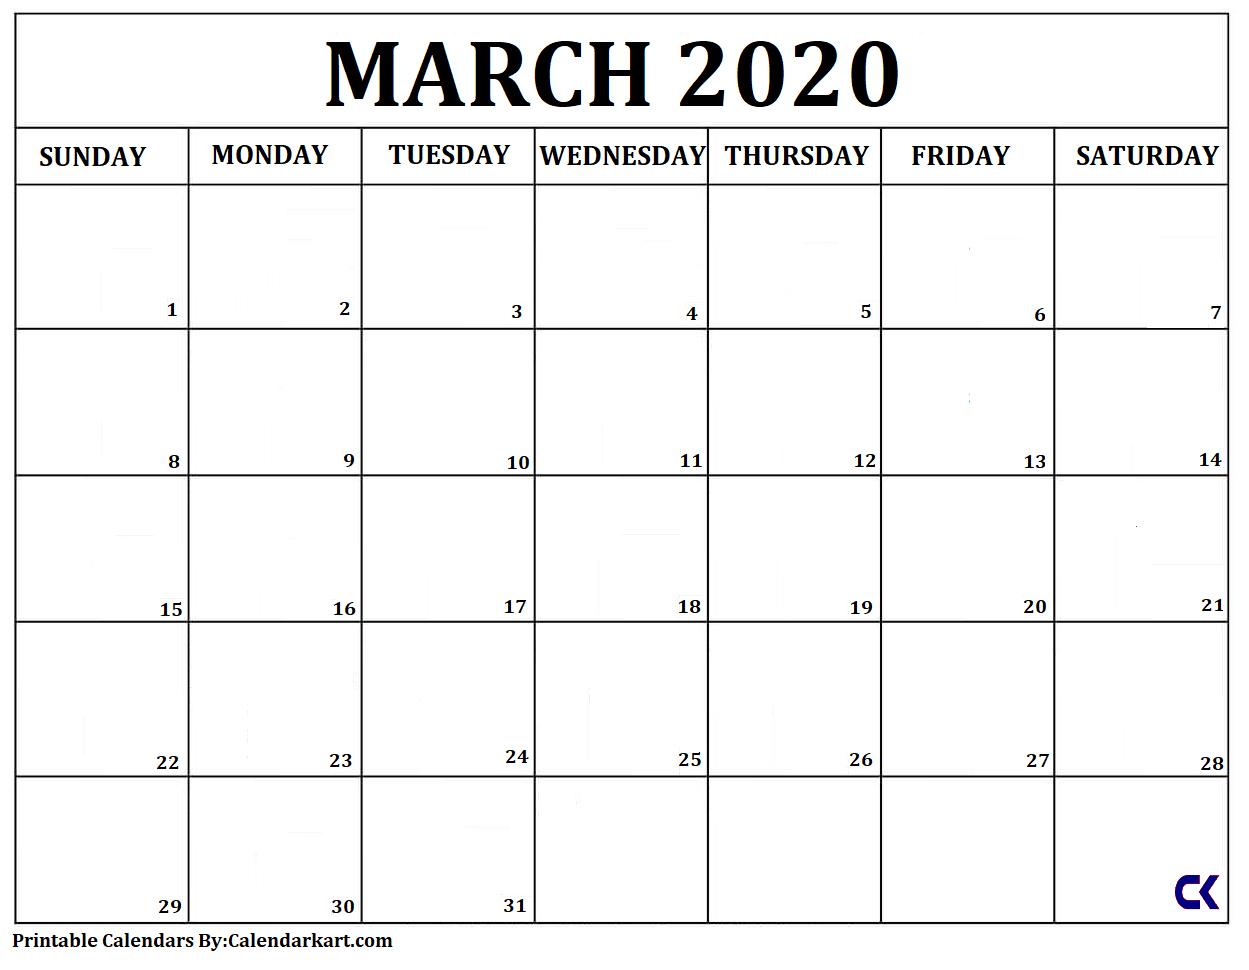 Free Printable Calendar Templates 2020 » Calendarkart Free Printable Calendar Large Blocks